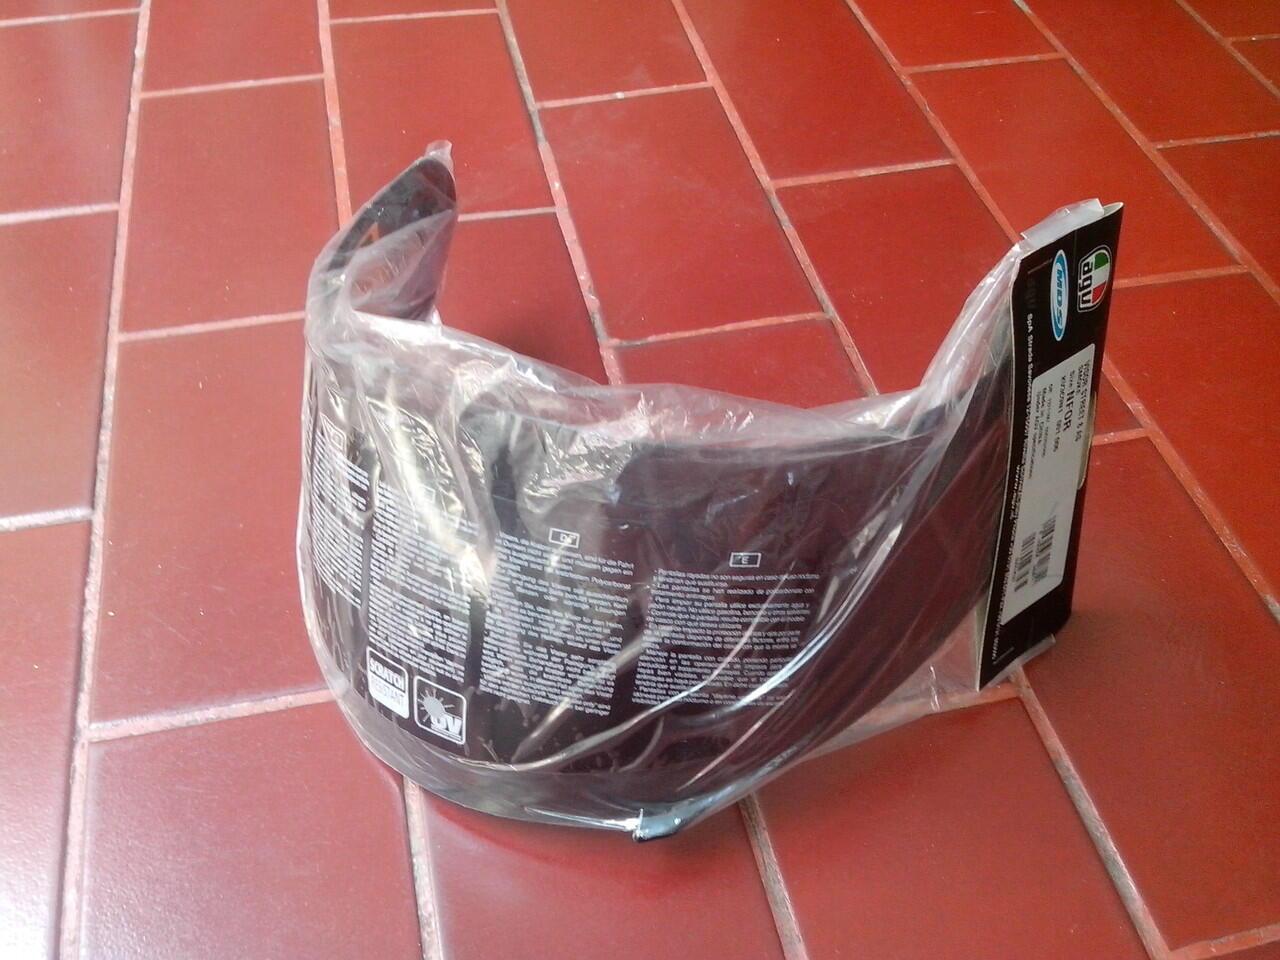 Terjual Wts Visor Kaca Helm Agv K3 Dark Smoke Clear Original